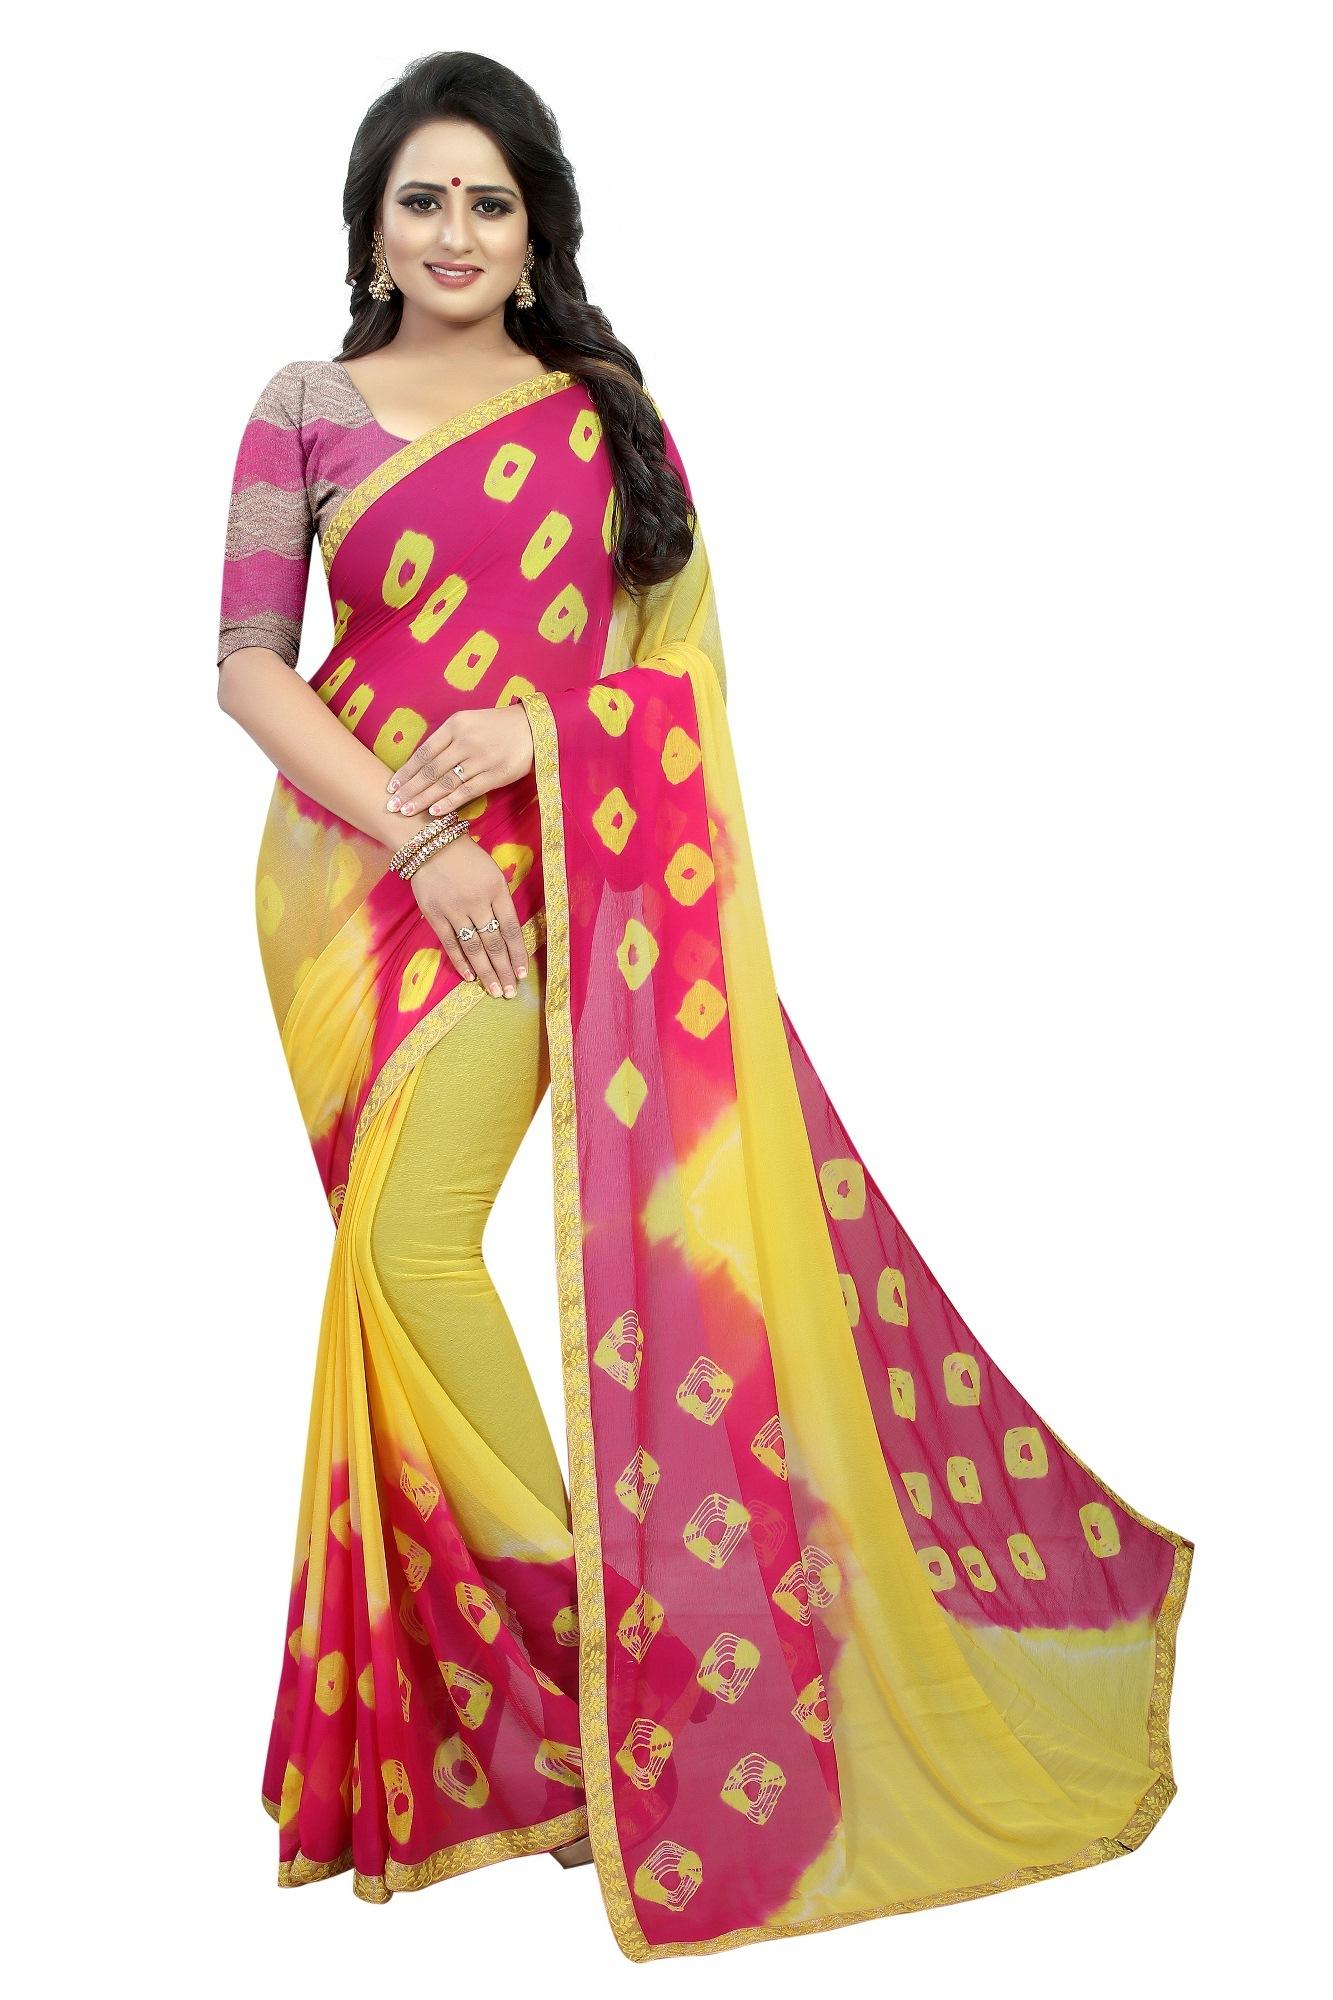 Fancy chiffon sarees